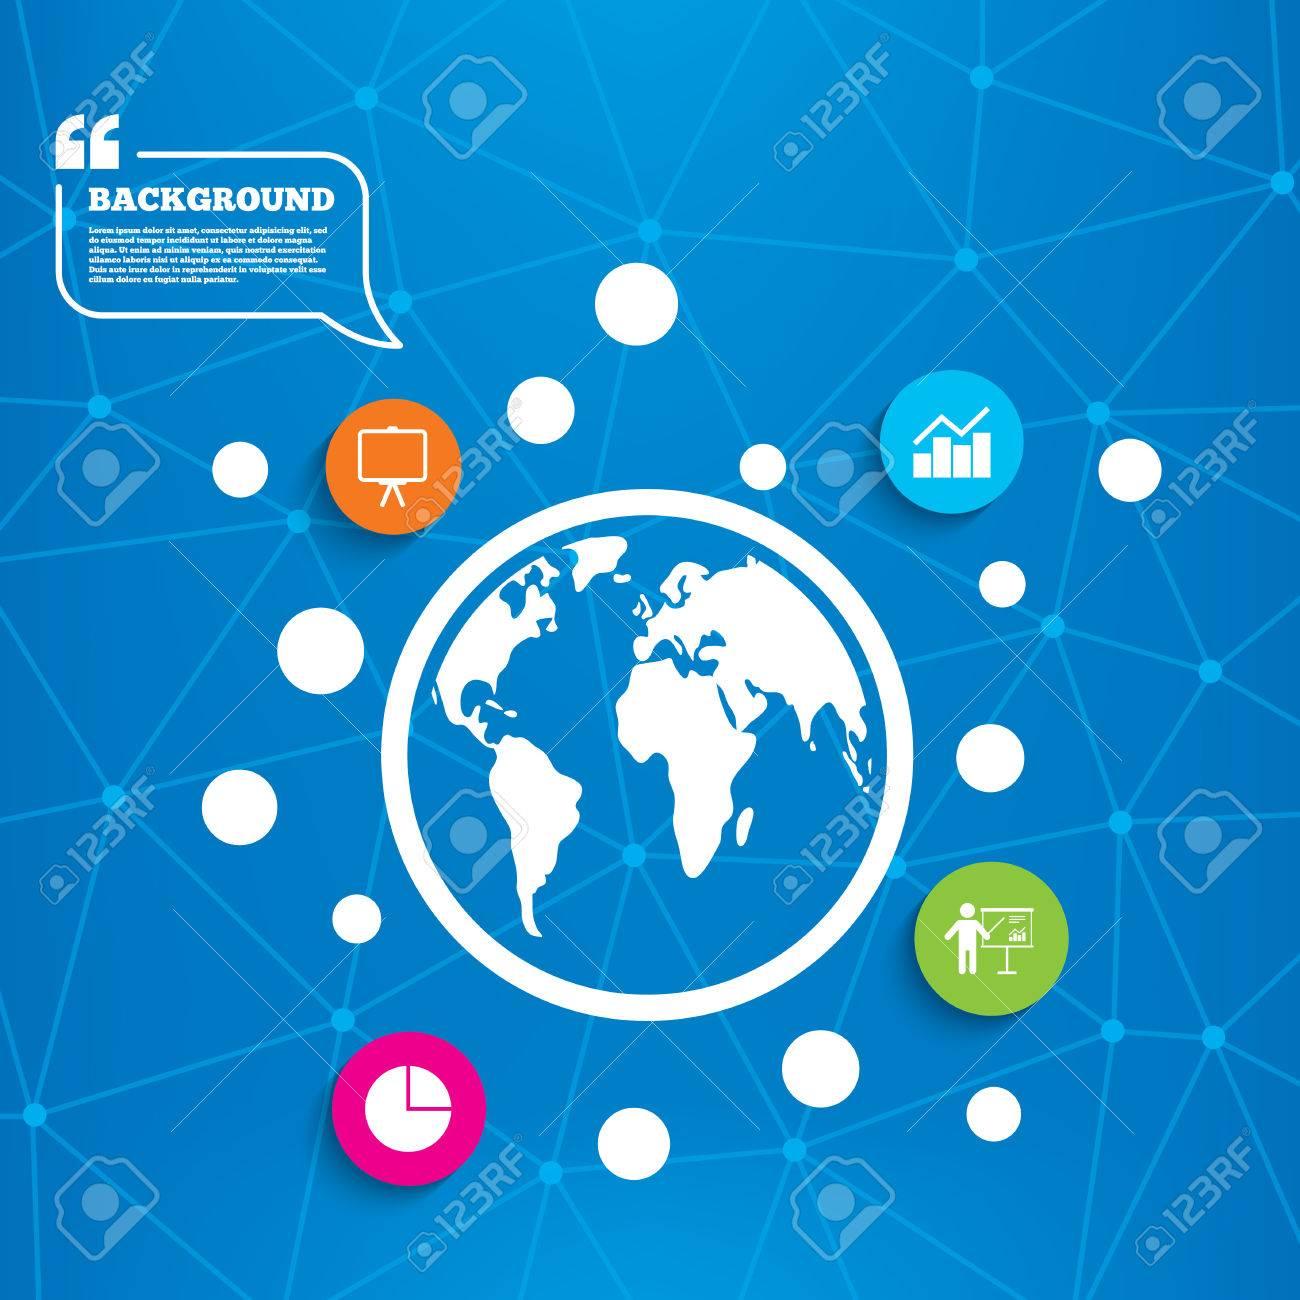 hight resolution of abstract world globe diagram graph pie chart icon presentation billboard symbol man standing